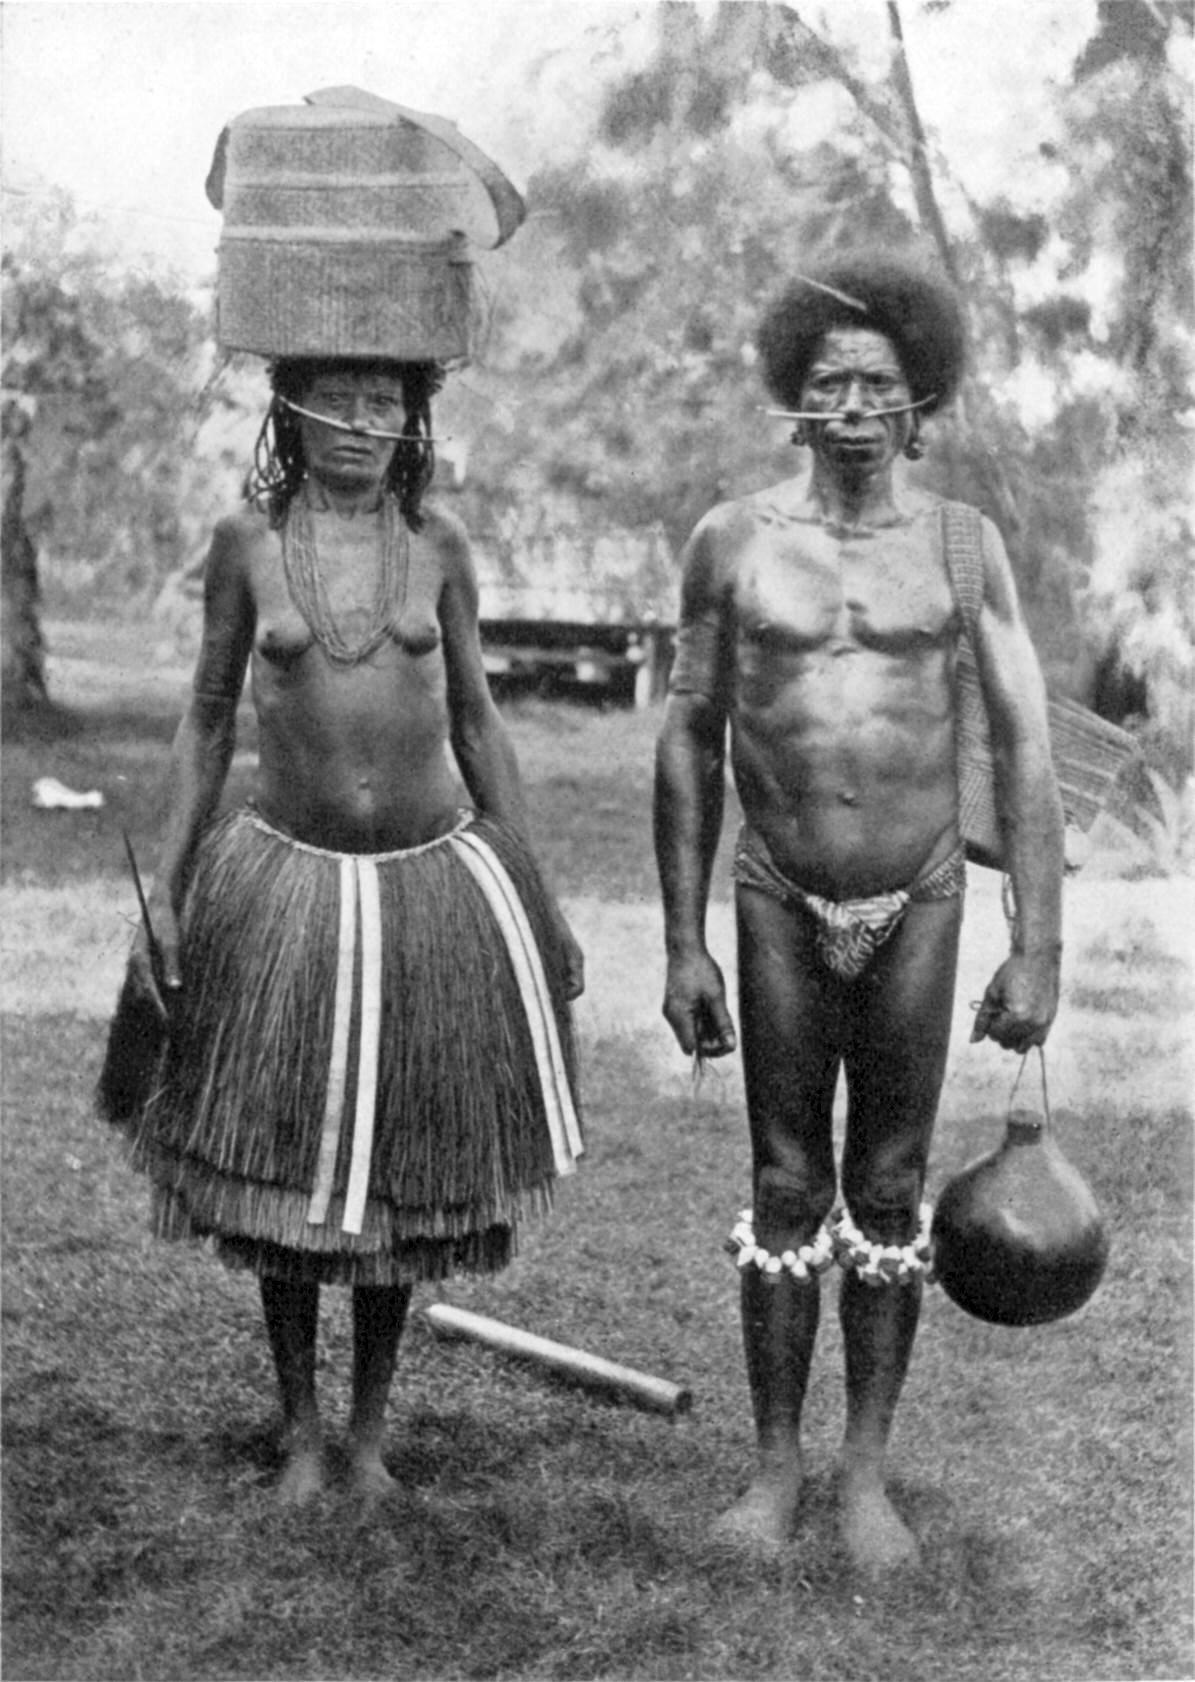 Trobriand Islanders Of Papua New Guinea